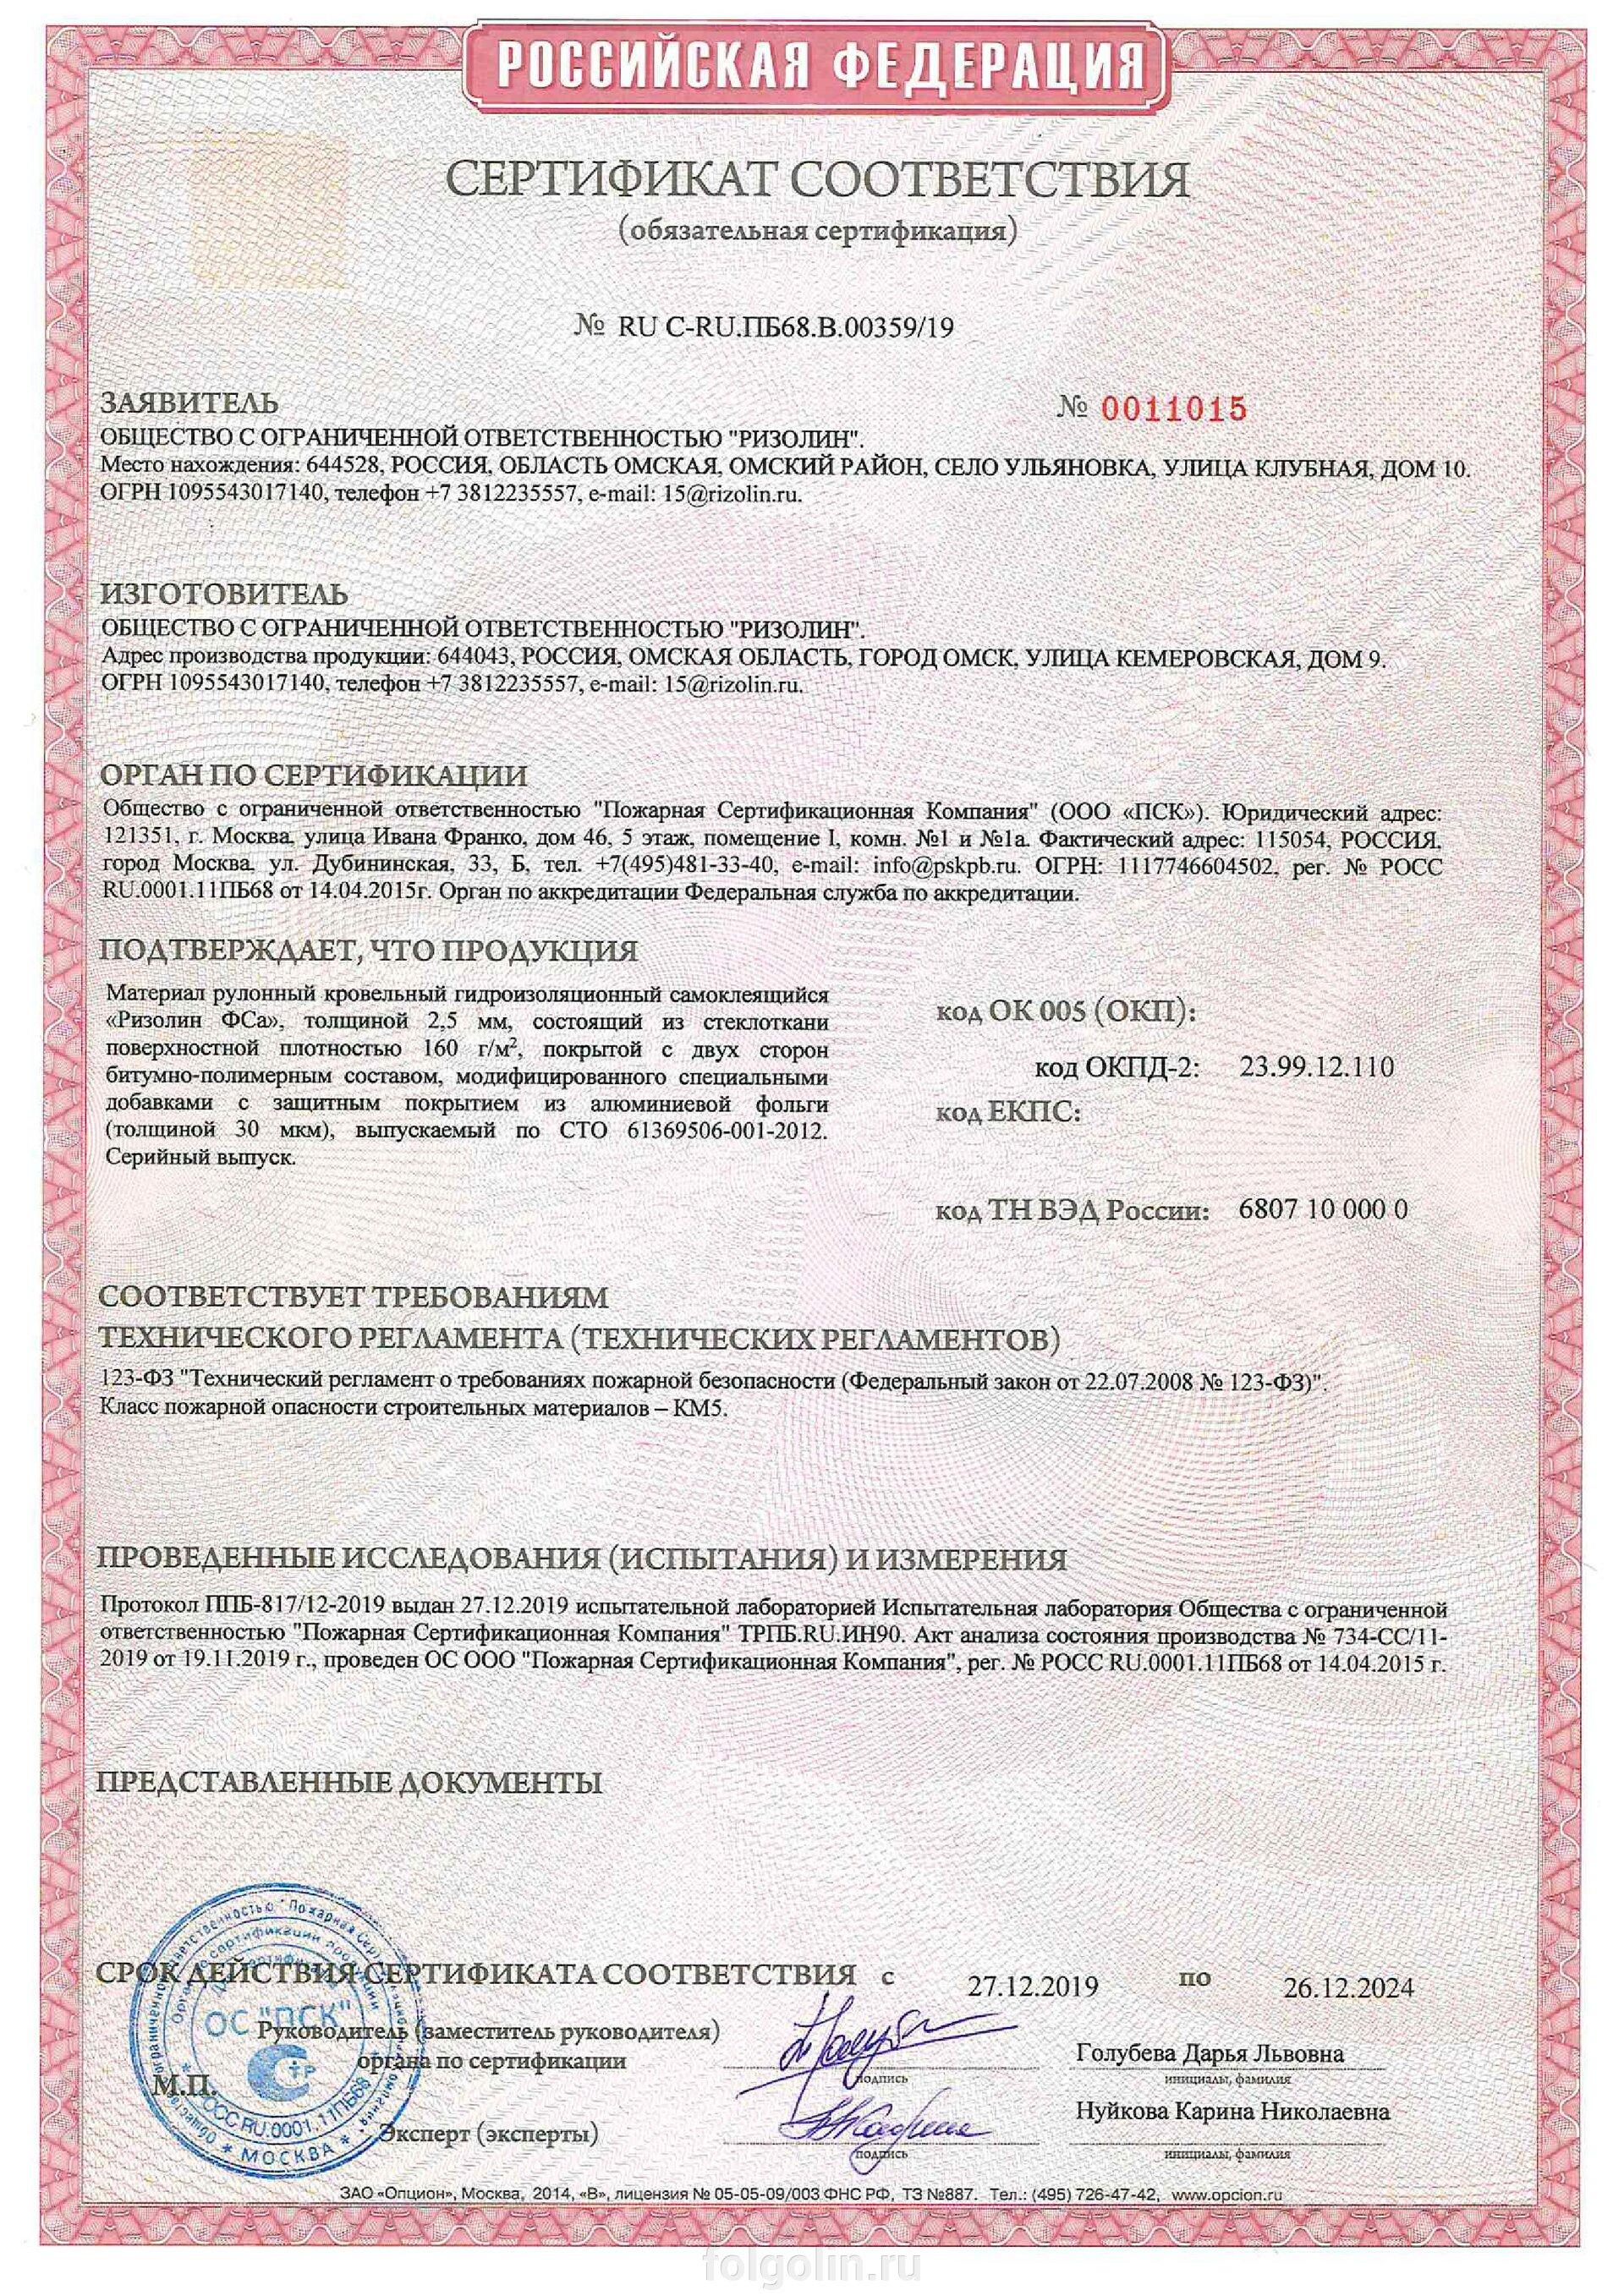 Сертификаты - фото pic_c1bd6f4da2fe12e94b97b4e73f4545b3_1920x9000_1.jpg